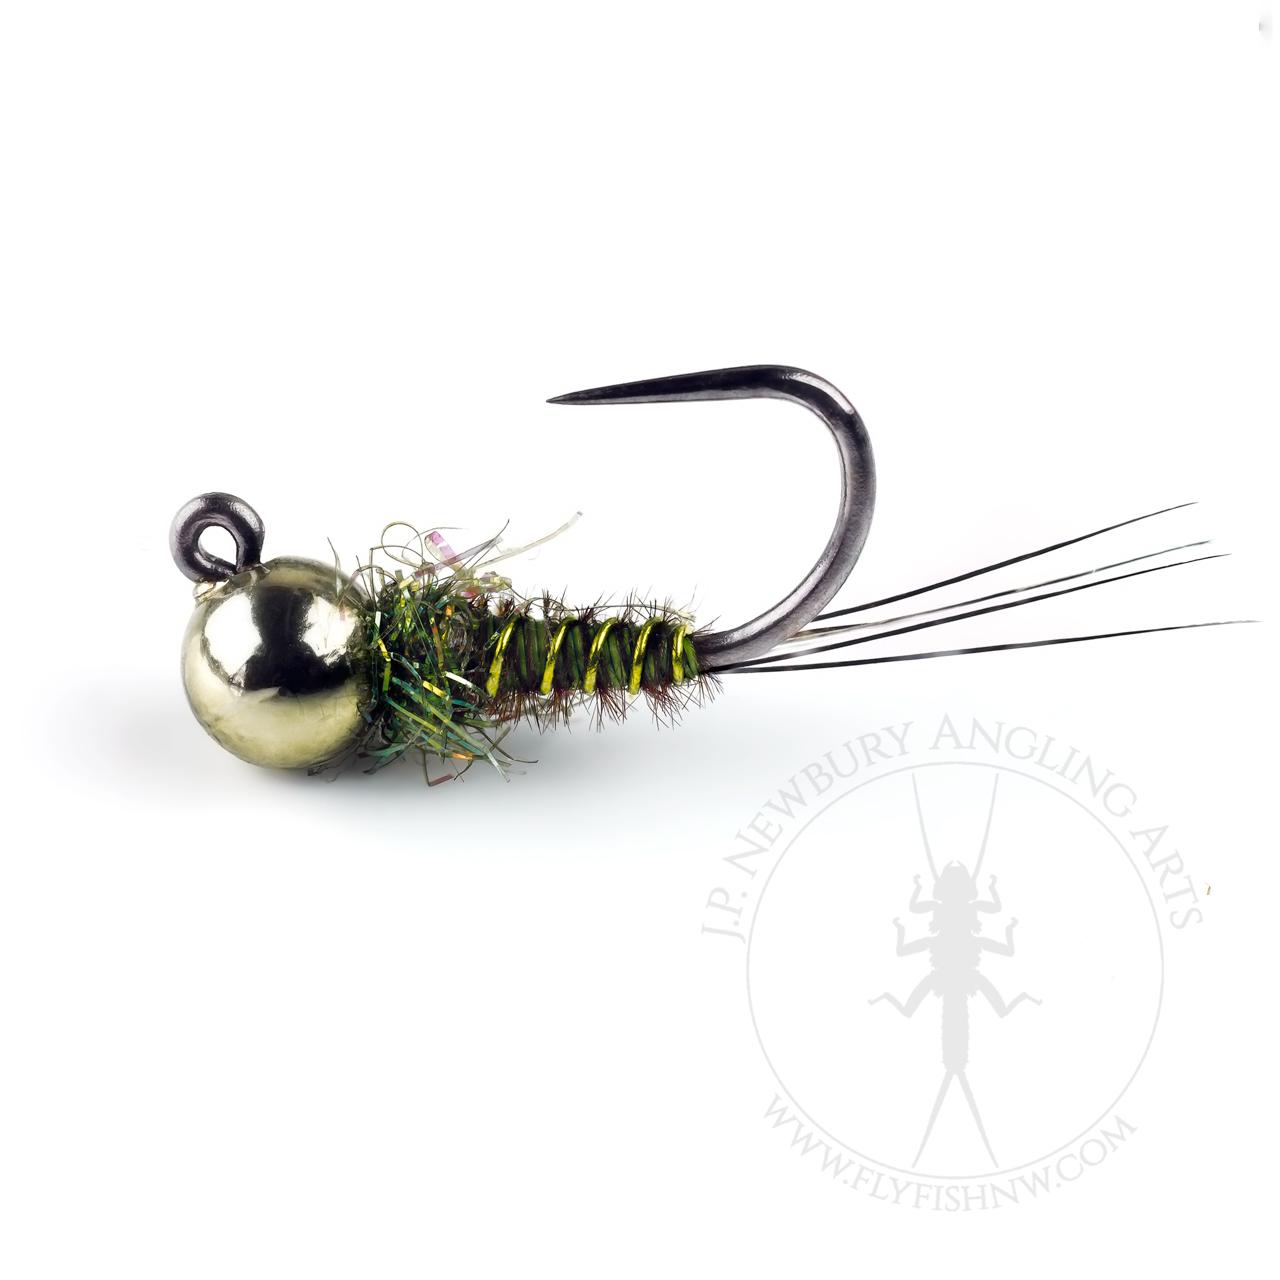 Metallic Olive Pheasant Tail Jig